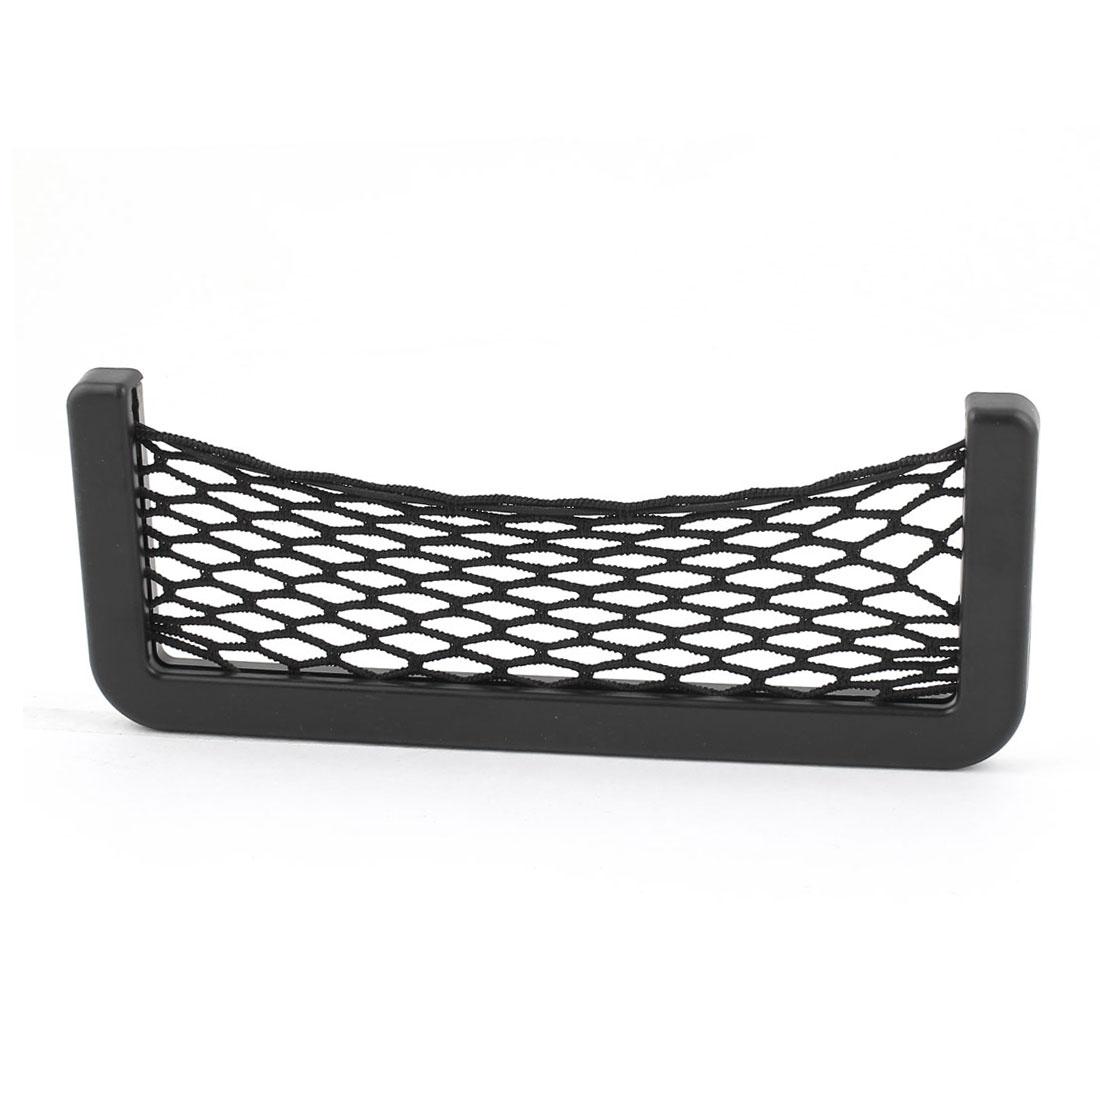 Black Auto Car Storage Mesh Resilient String Bag Nylon Pocket Holder Organizer